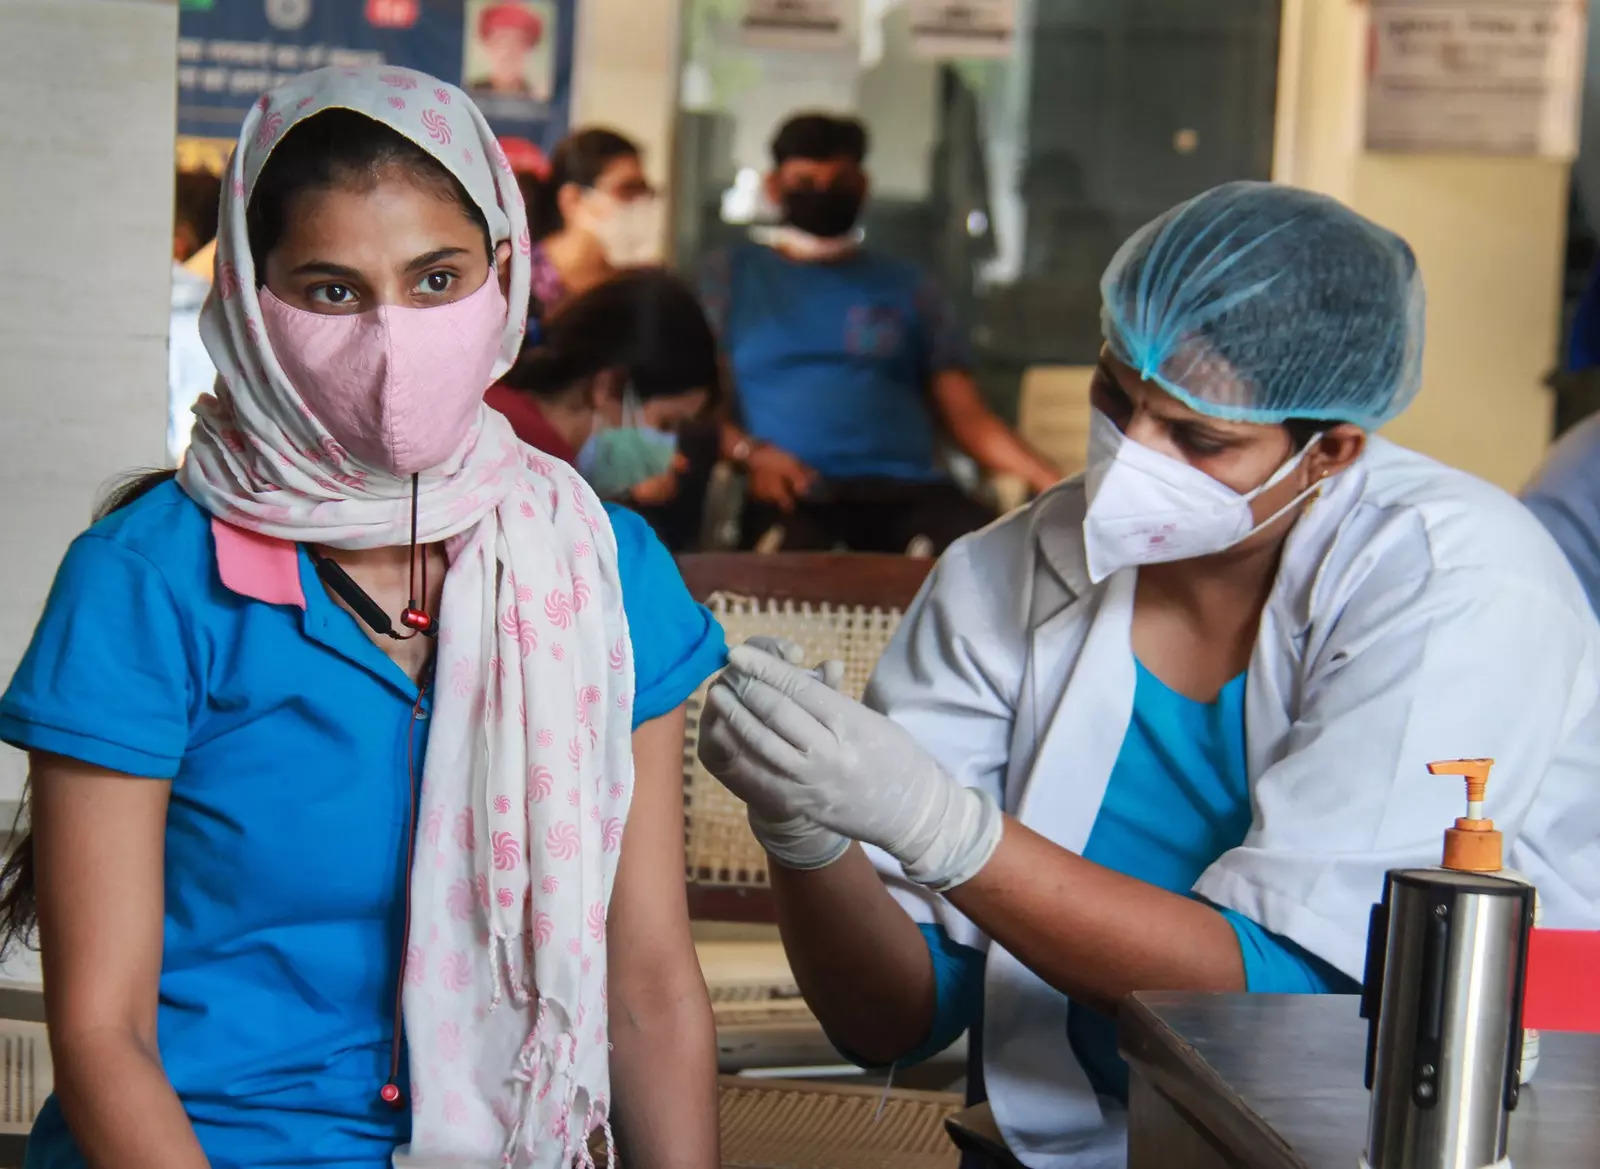 Delhi has only one day's Covaxin stock left: Satyendar Jain